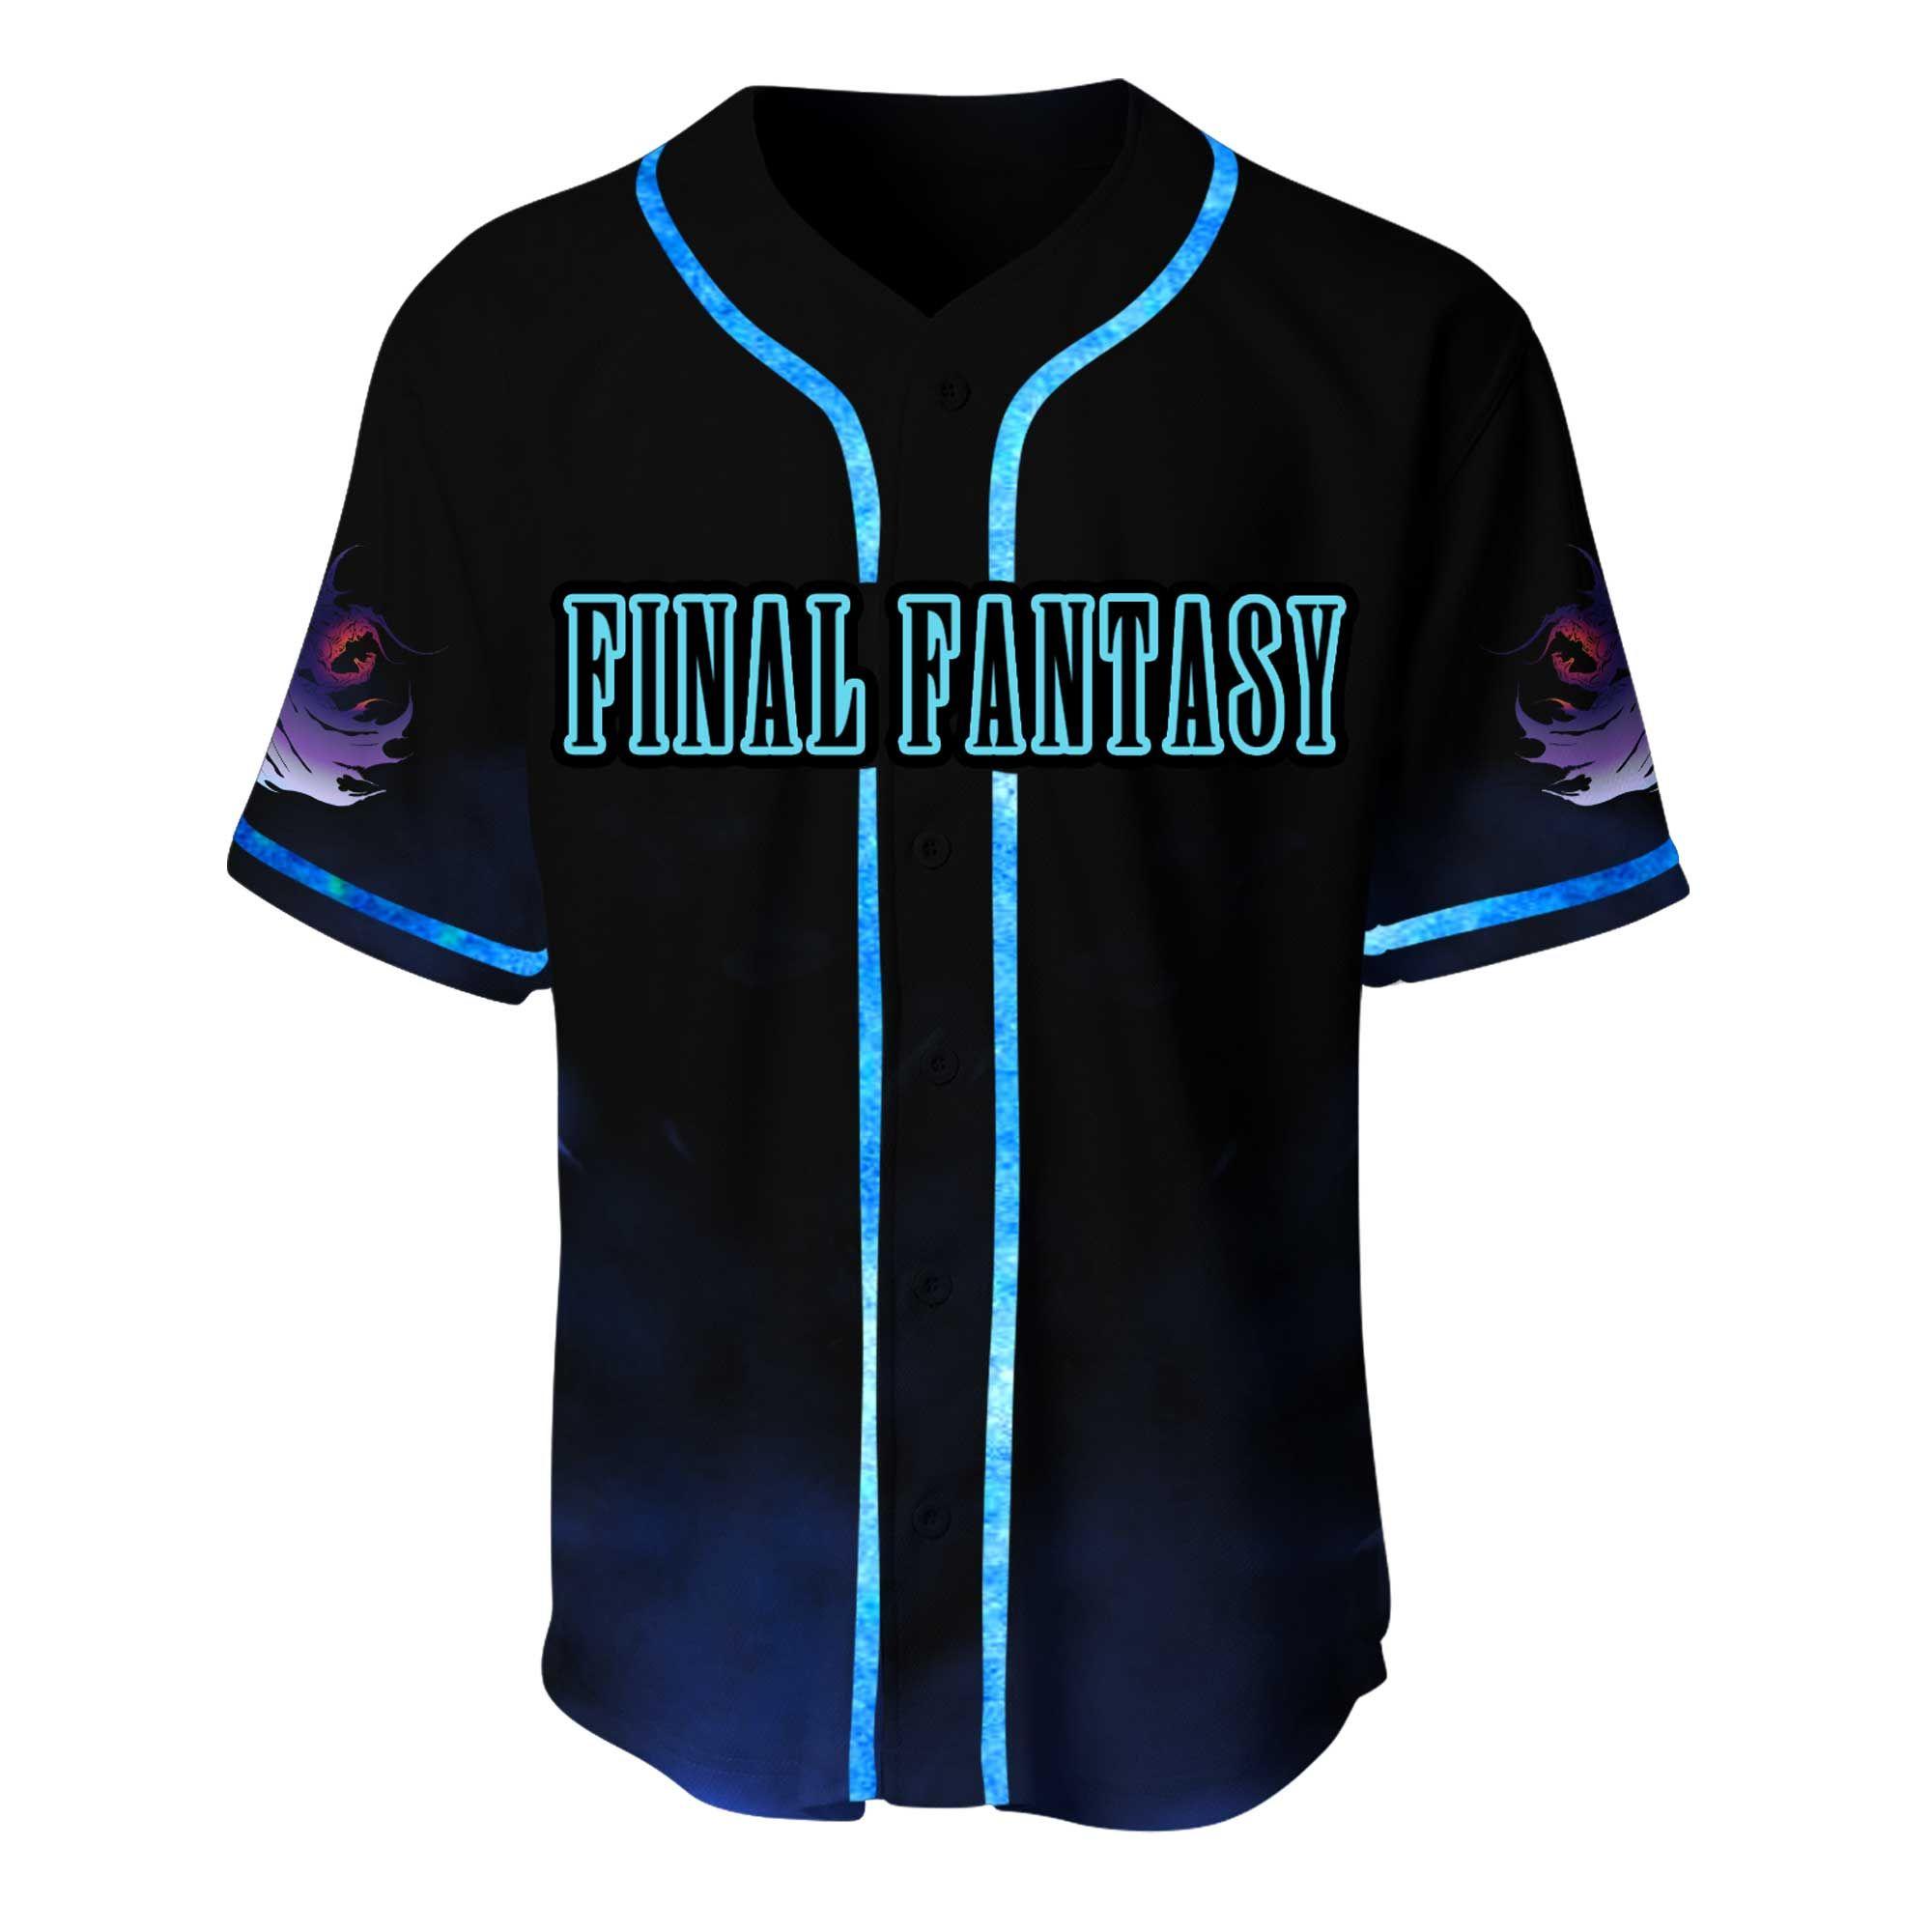 Final Fantasy Baseball Jersey Shirt